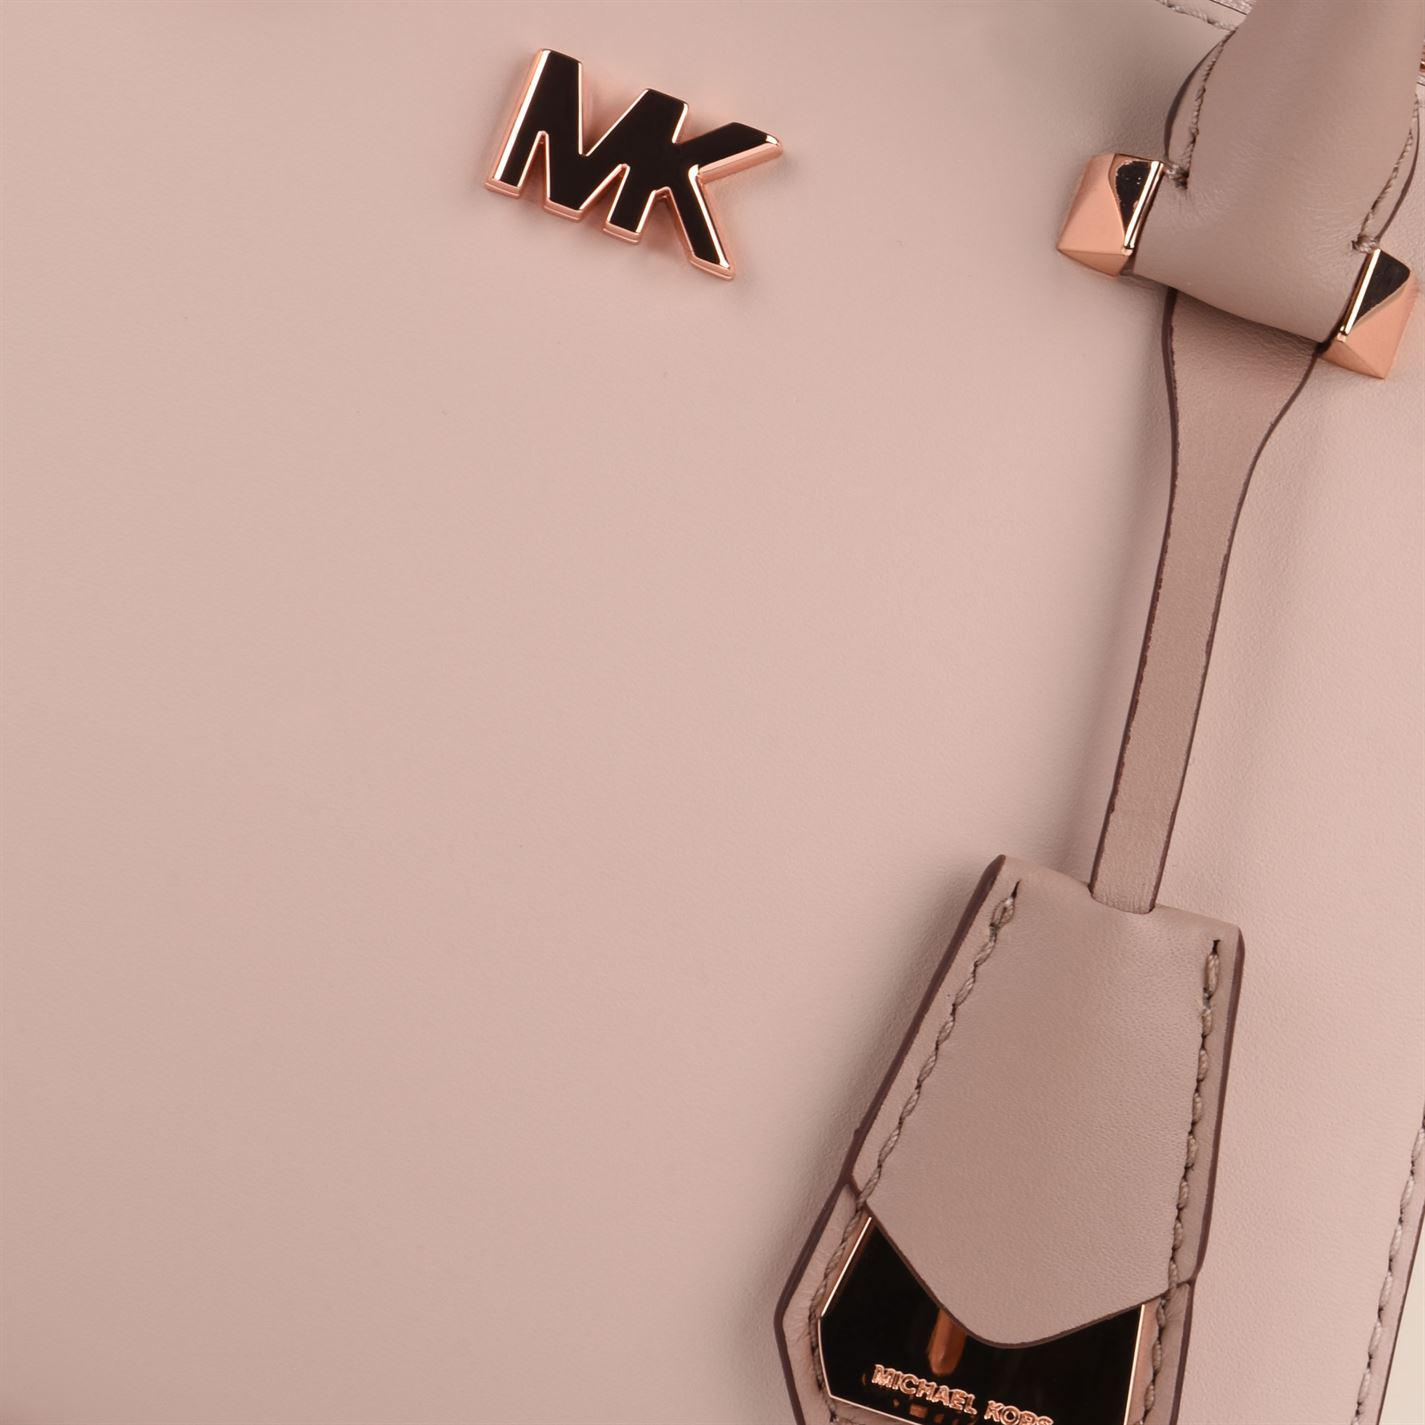 MICHAEL Michael Kors Mk Motto Messenger Bag in Pink - Lyst 289512a7eca04